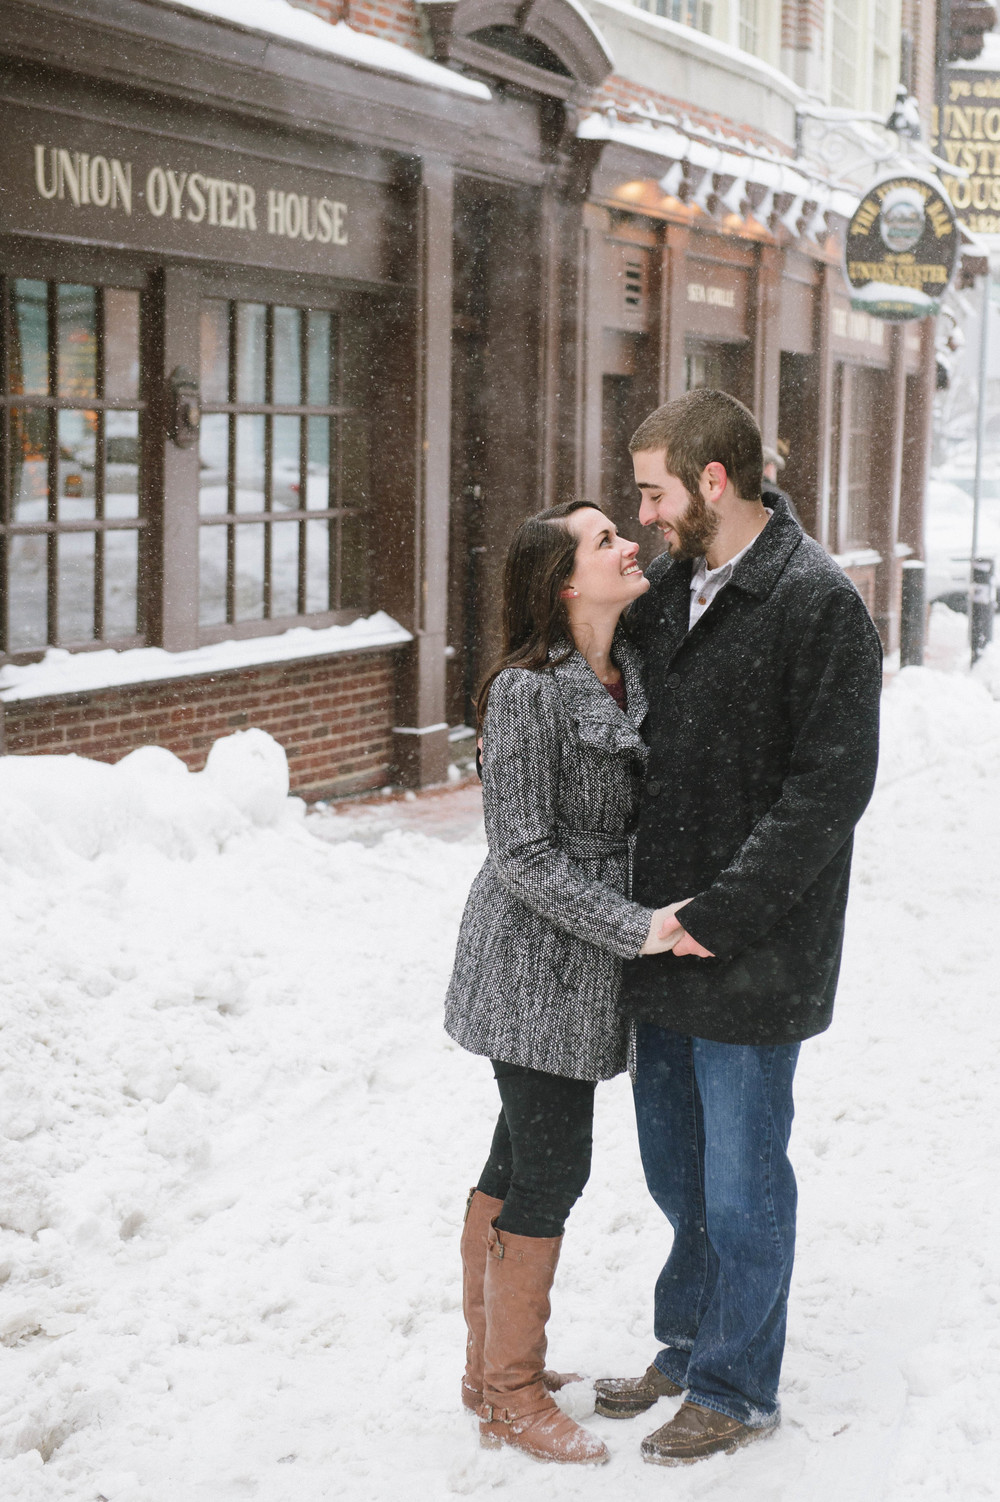 North_End_Boston_Engagement_Photo_Shoot005.jpg